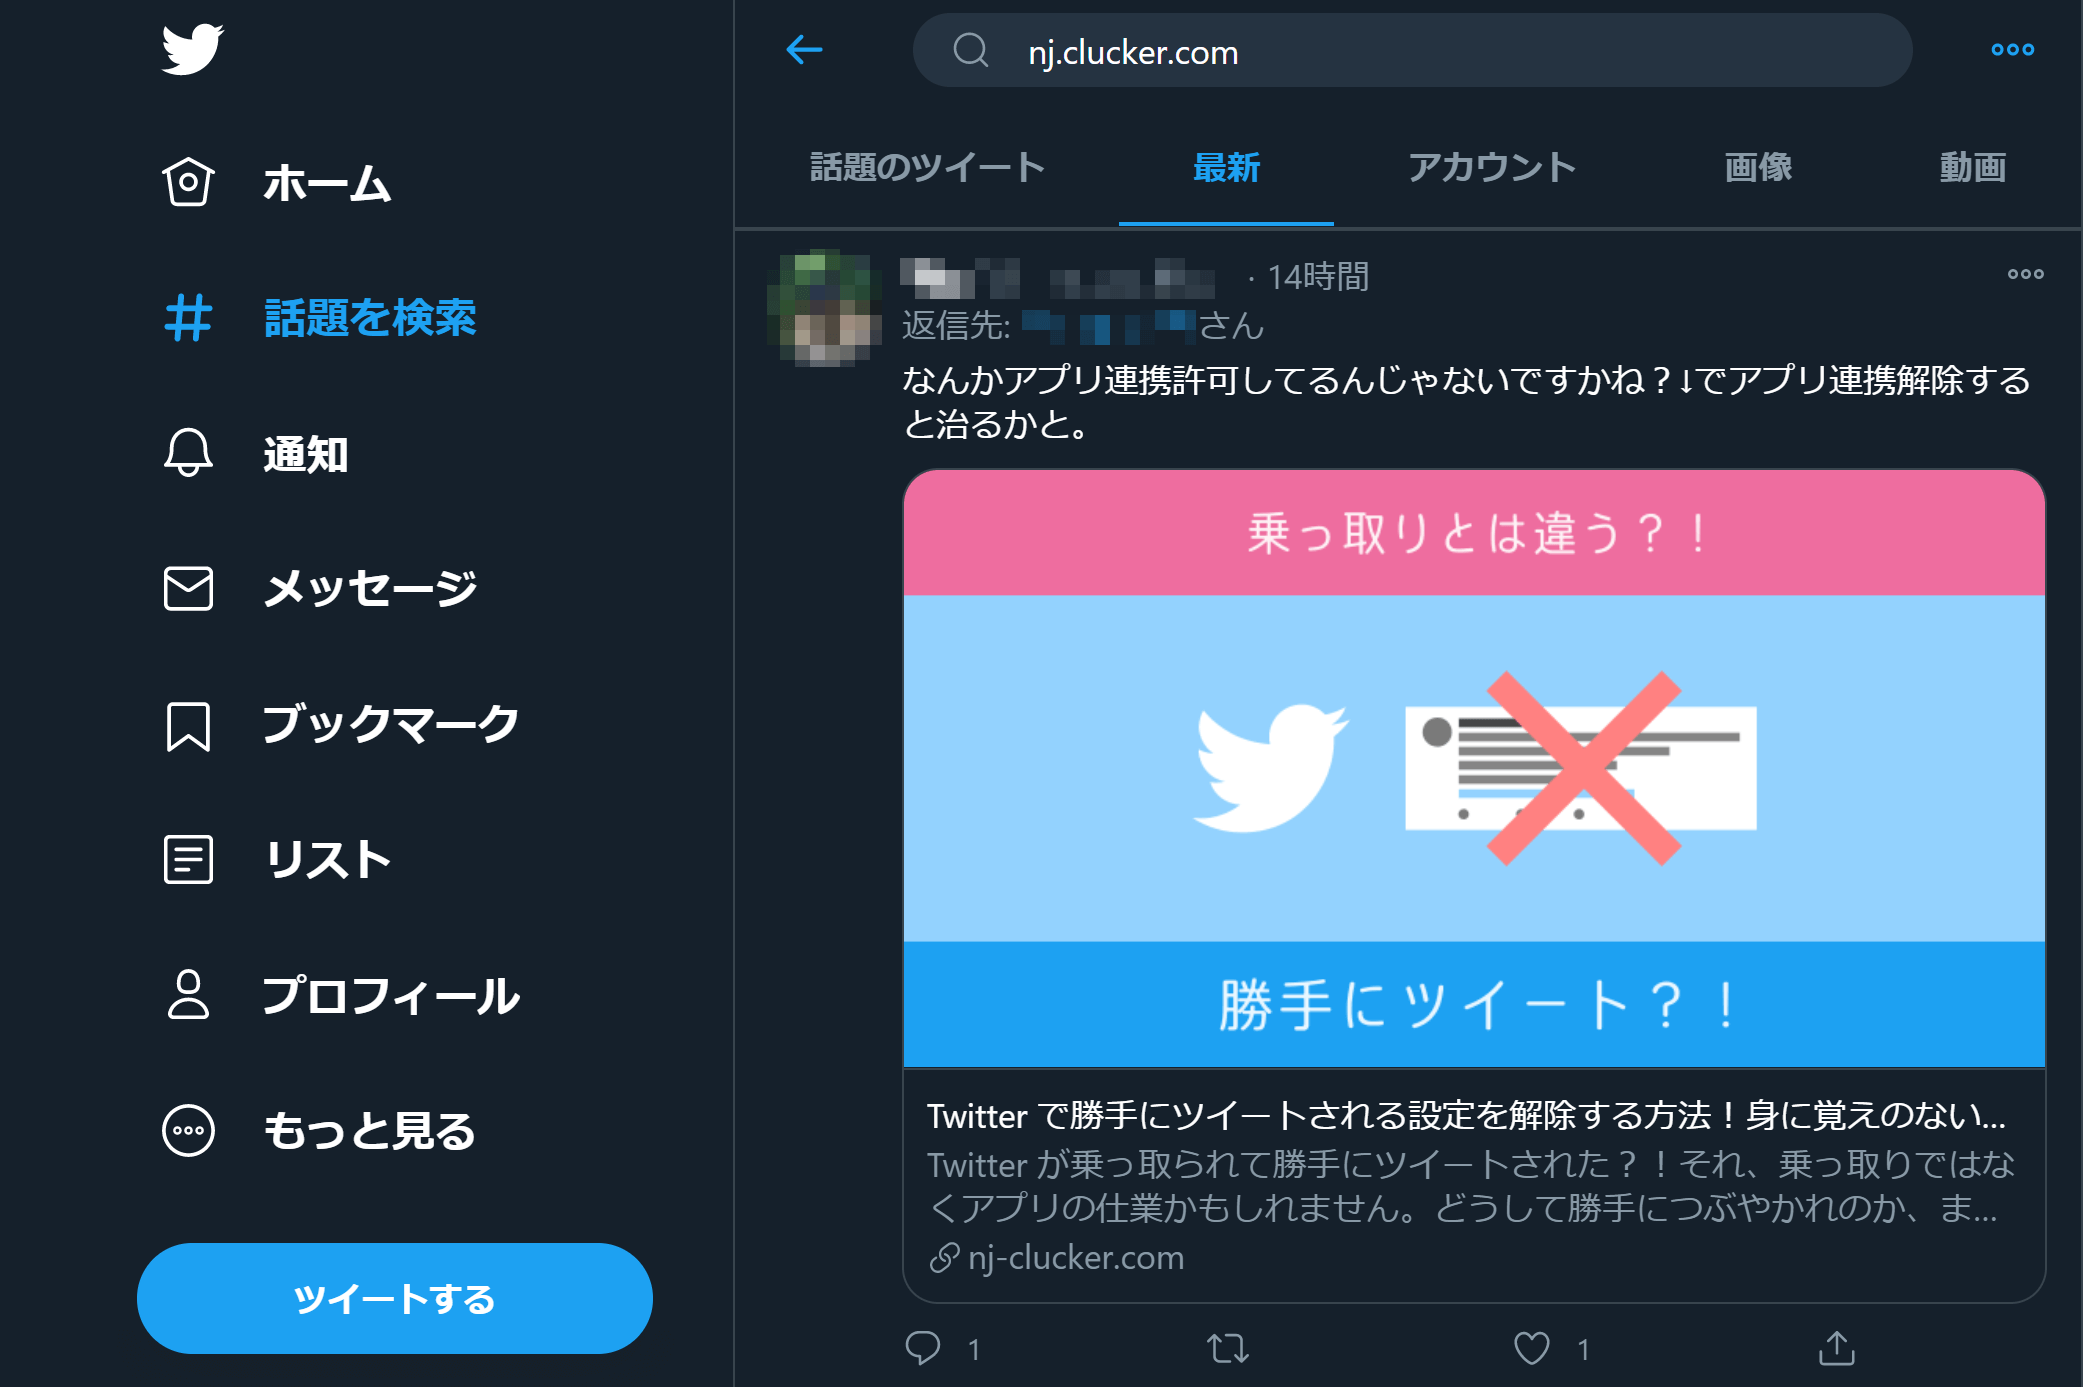 nj.clucker.com で検索